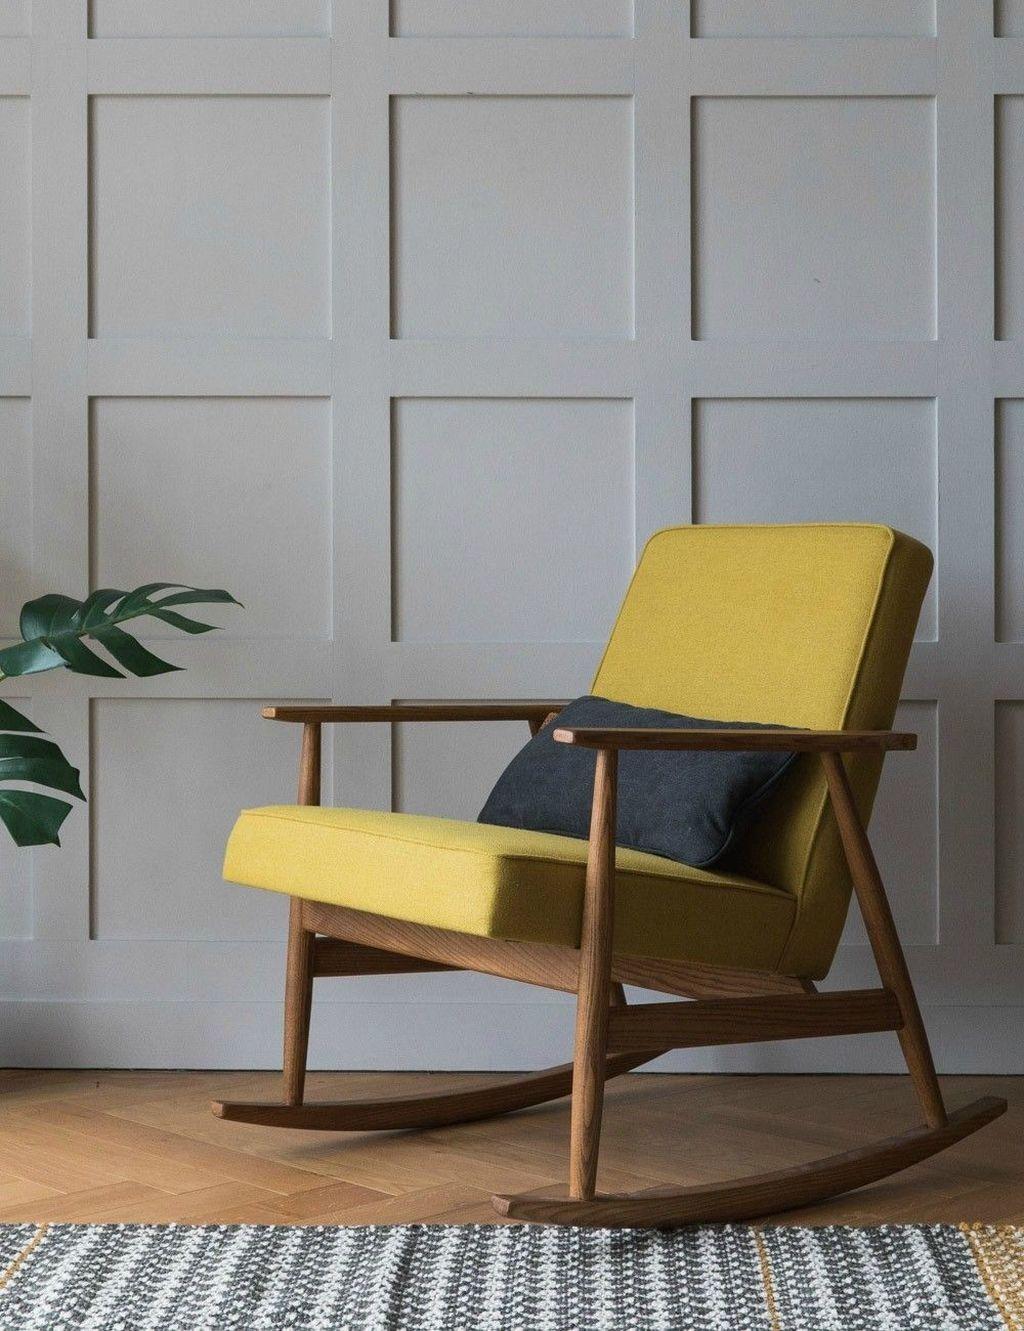 Amazing Rocking Chair Design Ideas 20